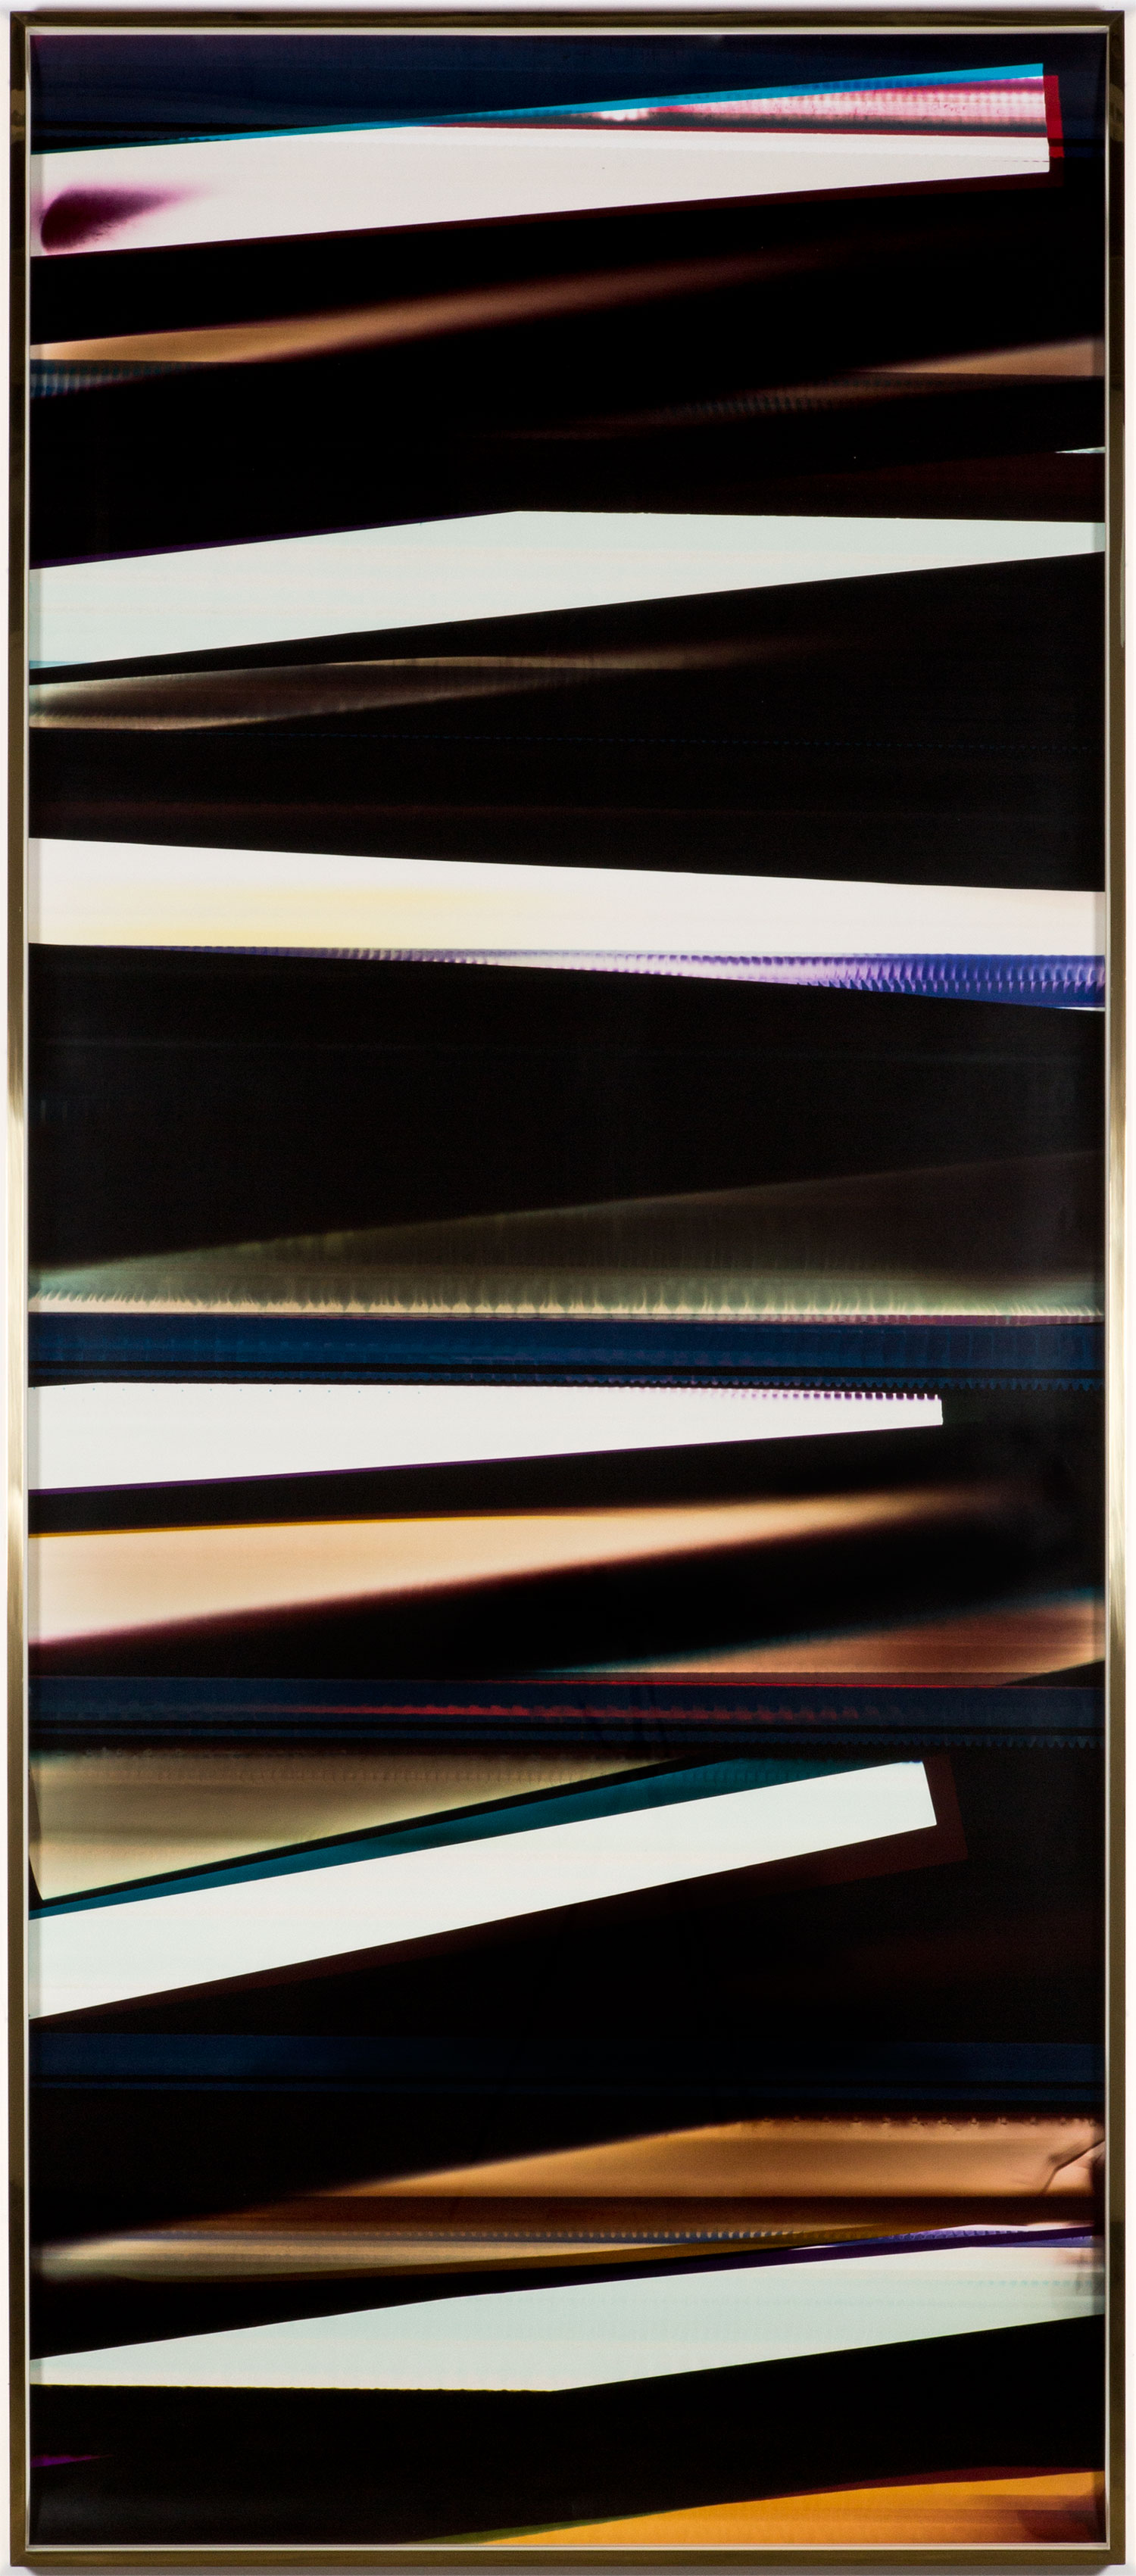 RA4 Contact Print / Processor Stall (9:6/MYC/Six Magnet: Los Angeles, California, July 15, 2014, Fuji Color Crystal Archive Super Type C, Em. No. 107-116, 75414), Kreonite KM IV 5225 RA4 Color Processor, Ser. No. 00092174    2016   Color photographic paper  119 3/4 x 51 1/2 inches   RA4 Contact Prints, 2014–